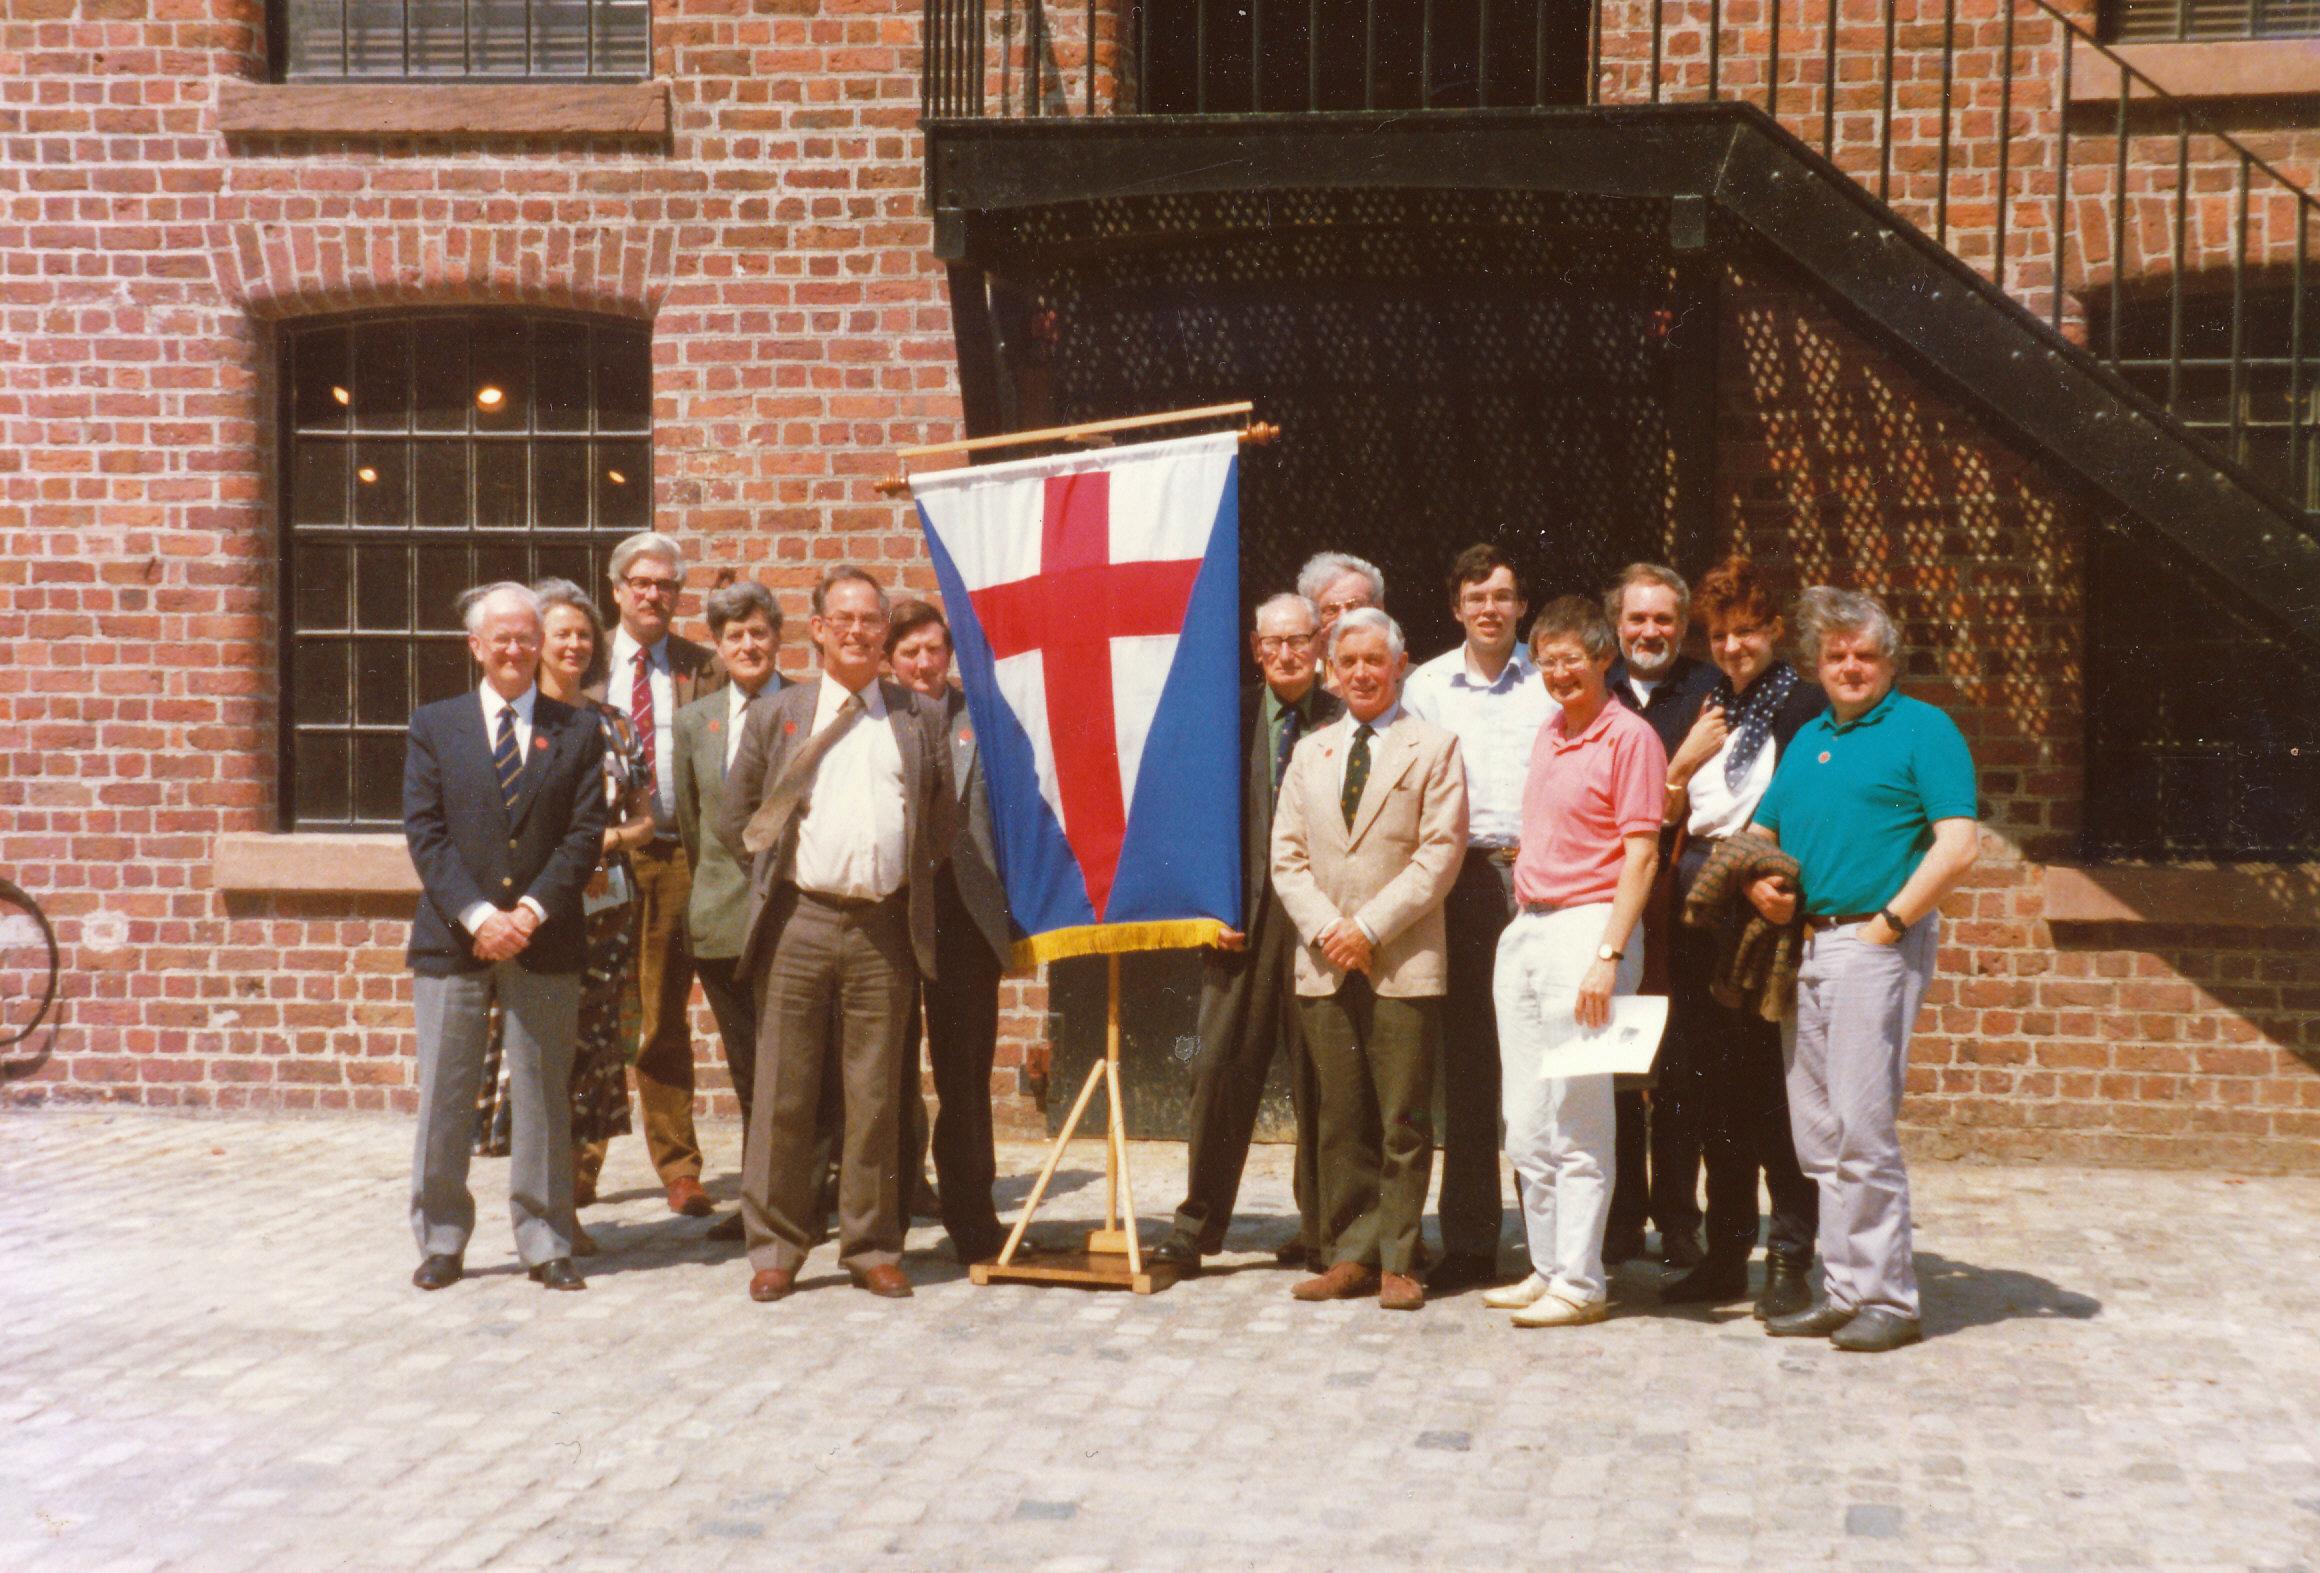 https://www.flaginstitute.org/wp/wp-content/uploads/2021/04/1988lpool-01.jpg